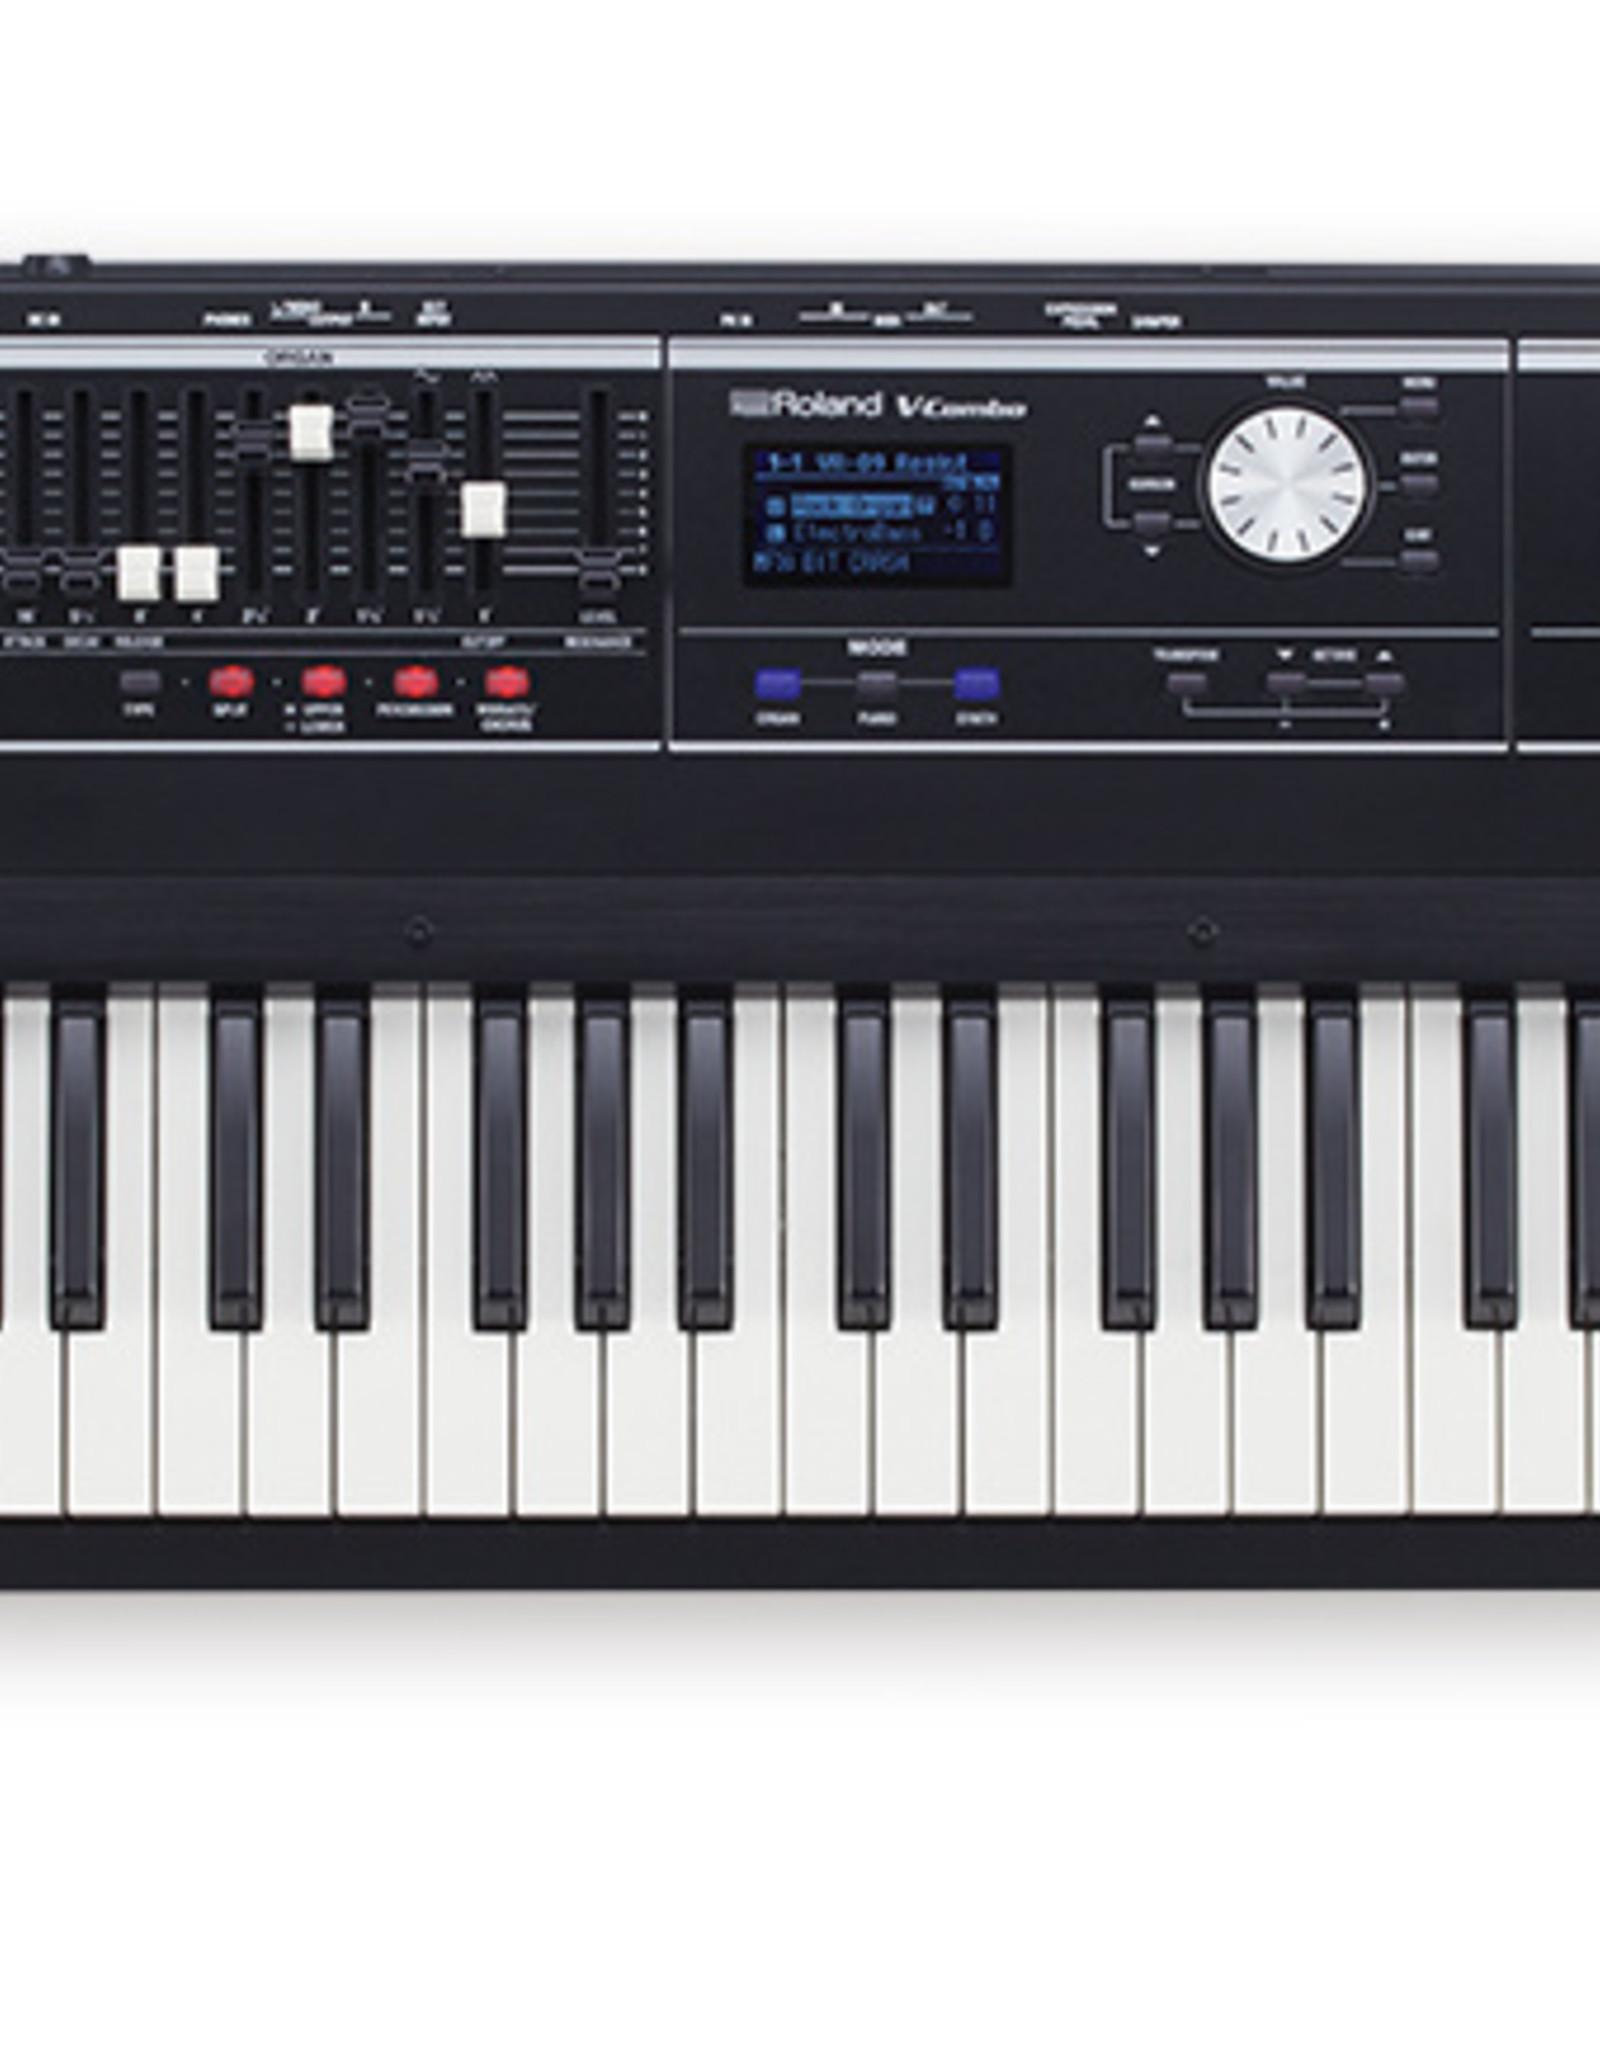 Roland Roland VR-730 Live Performance Keyboard